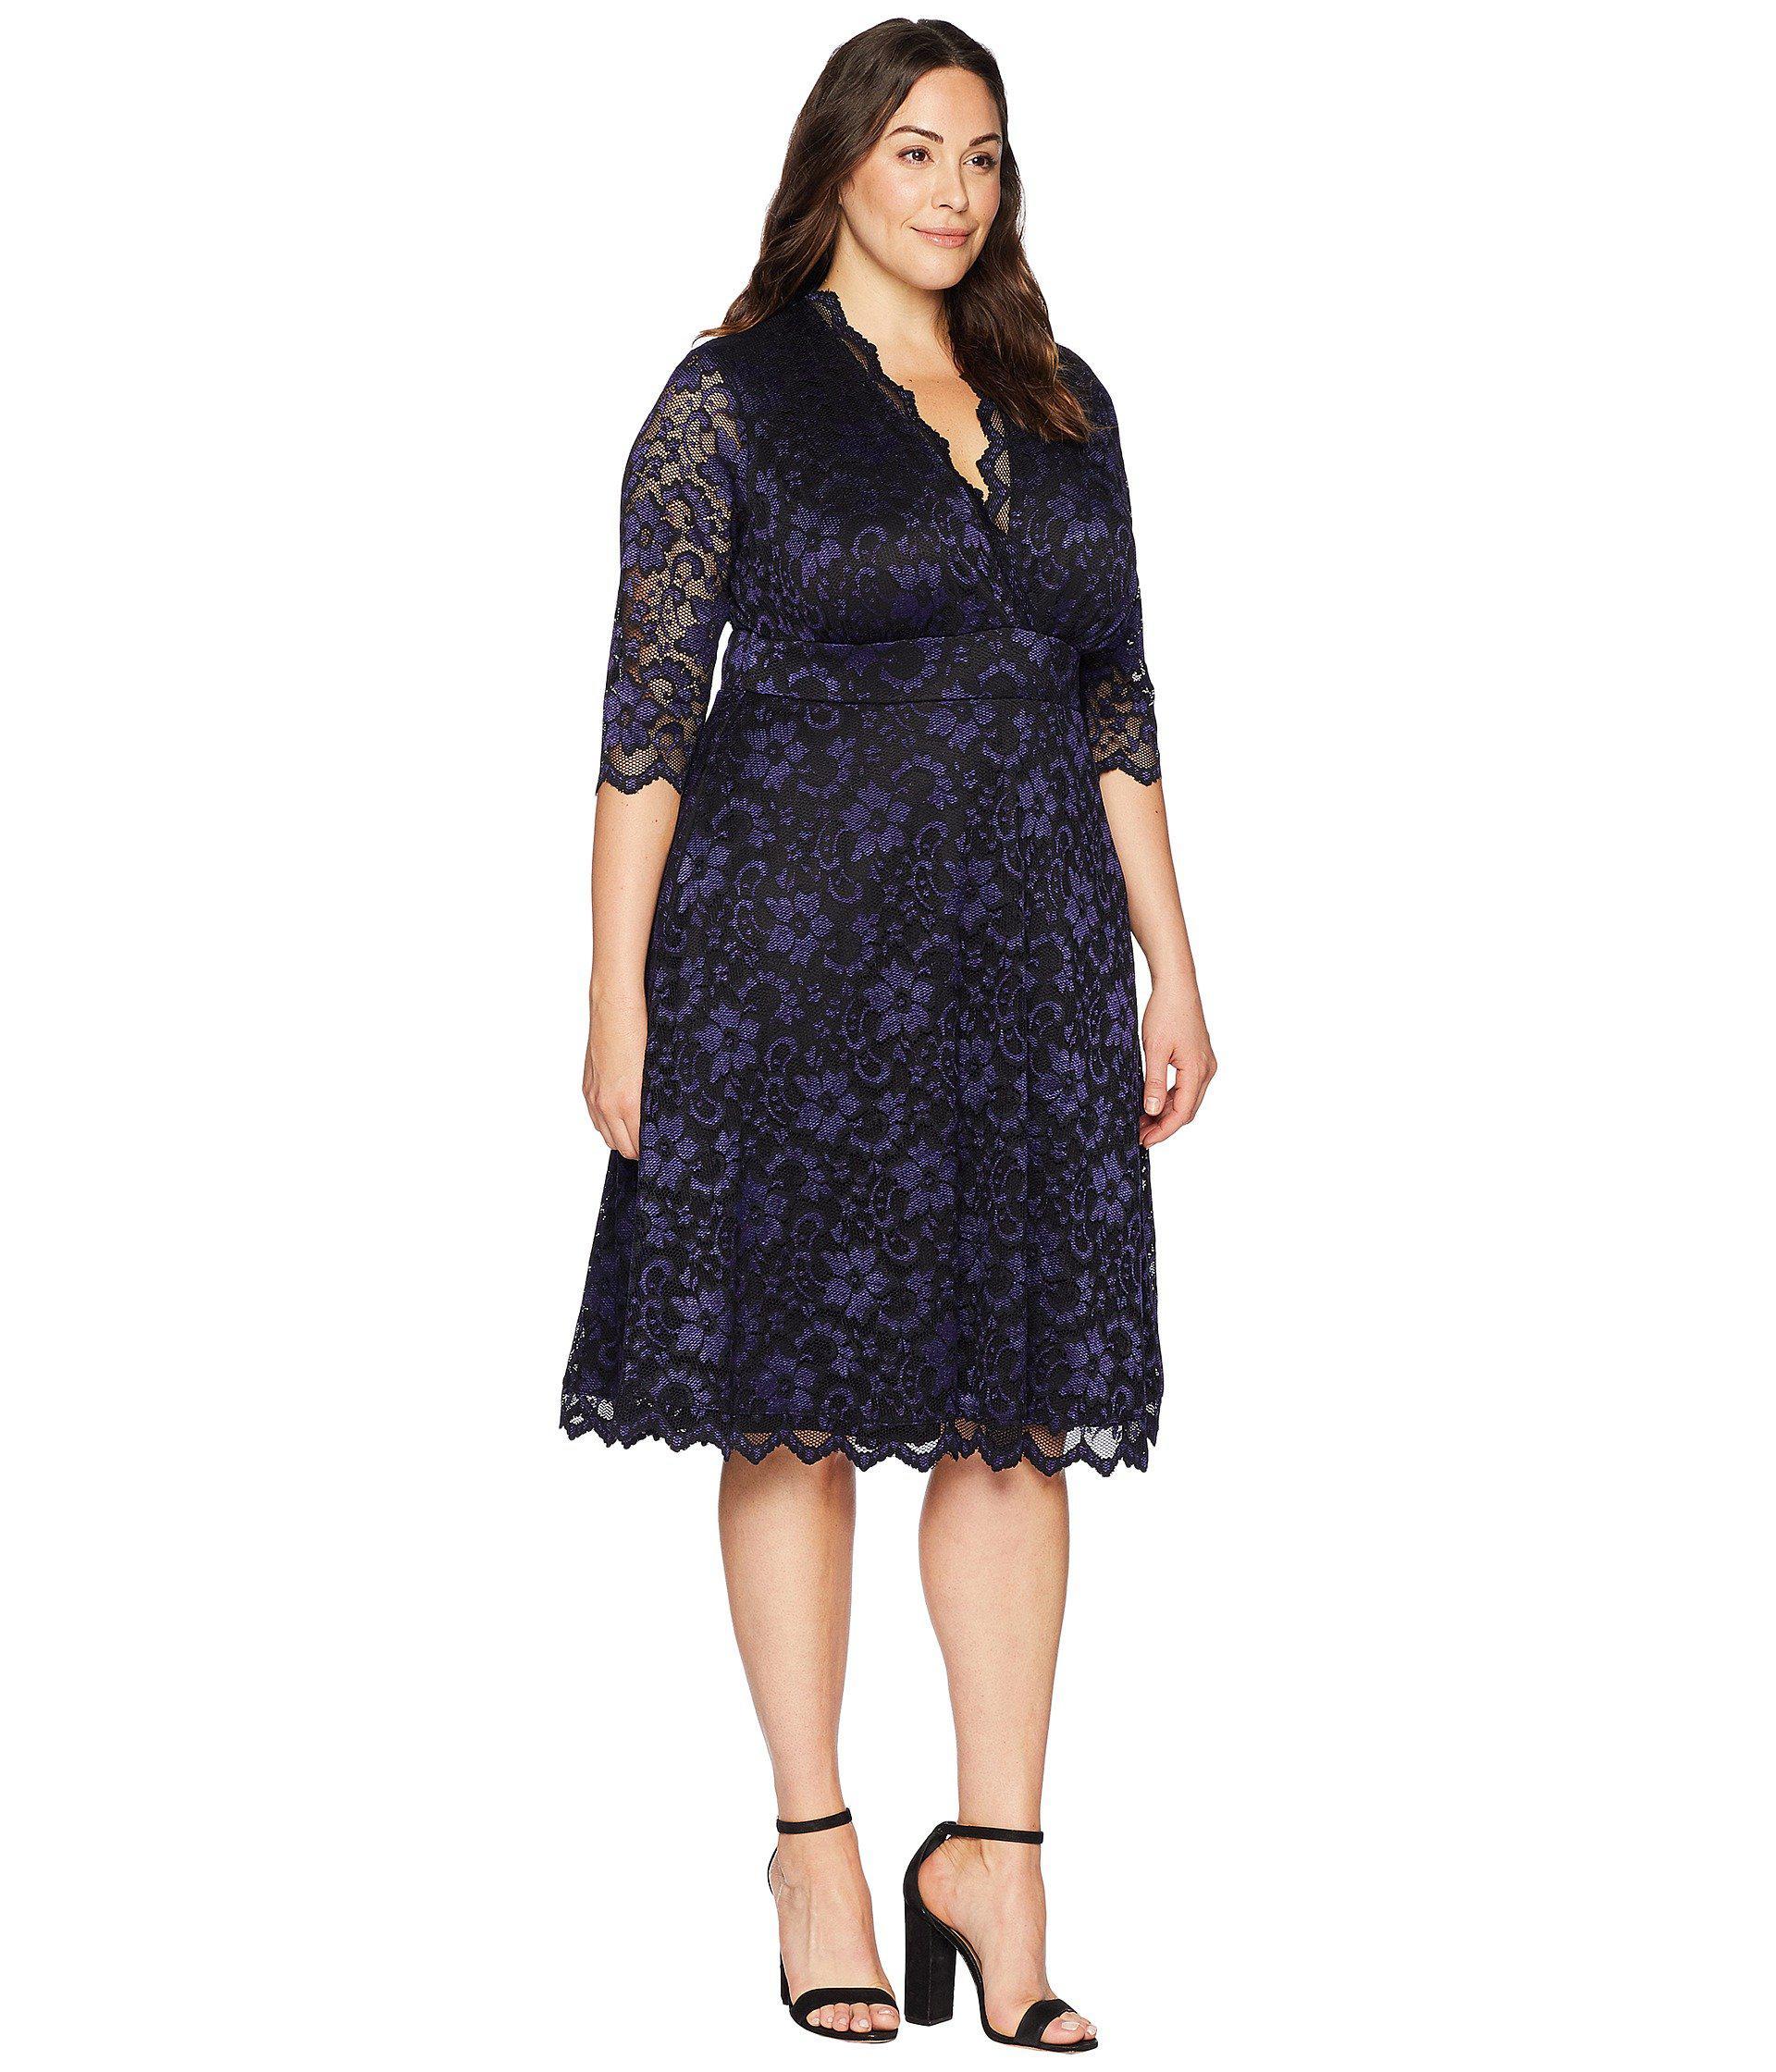 ed29dccad6d Kiyonna - Blue Mon Cherie Lace Dress - Lyst. View fullscreen